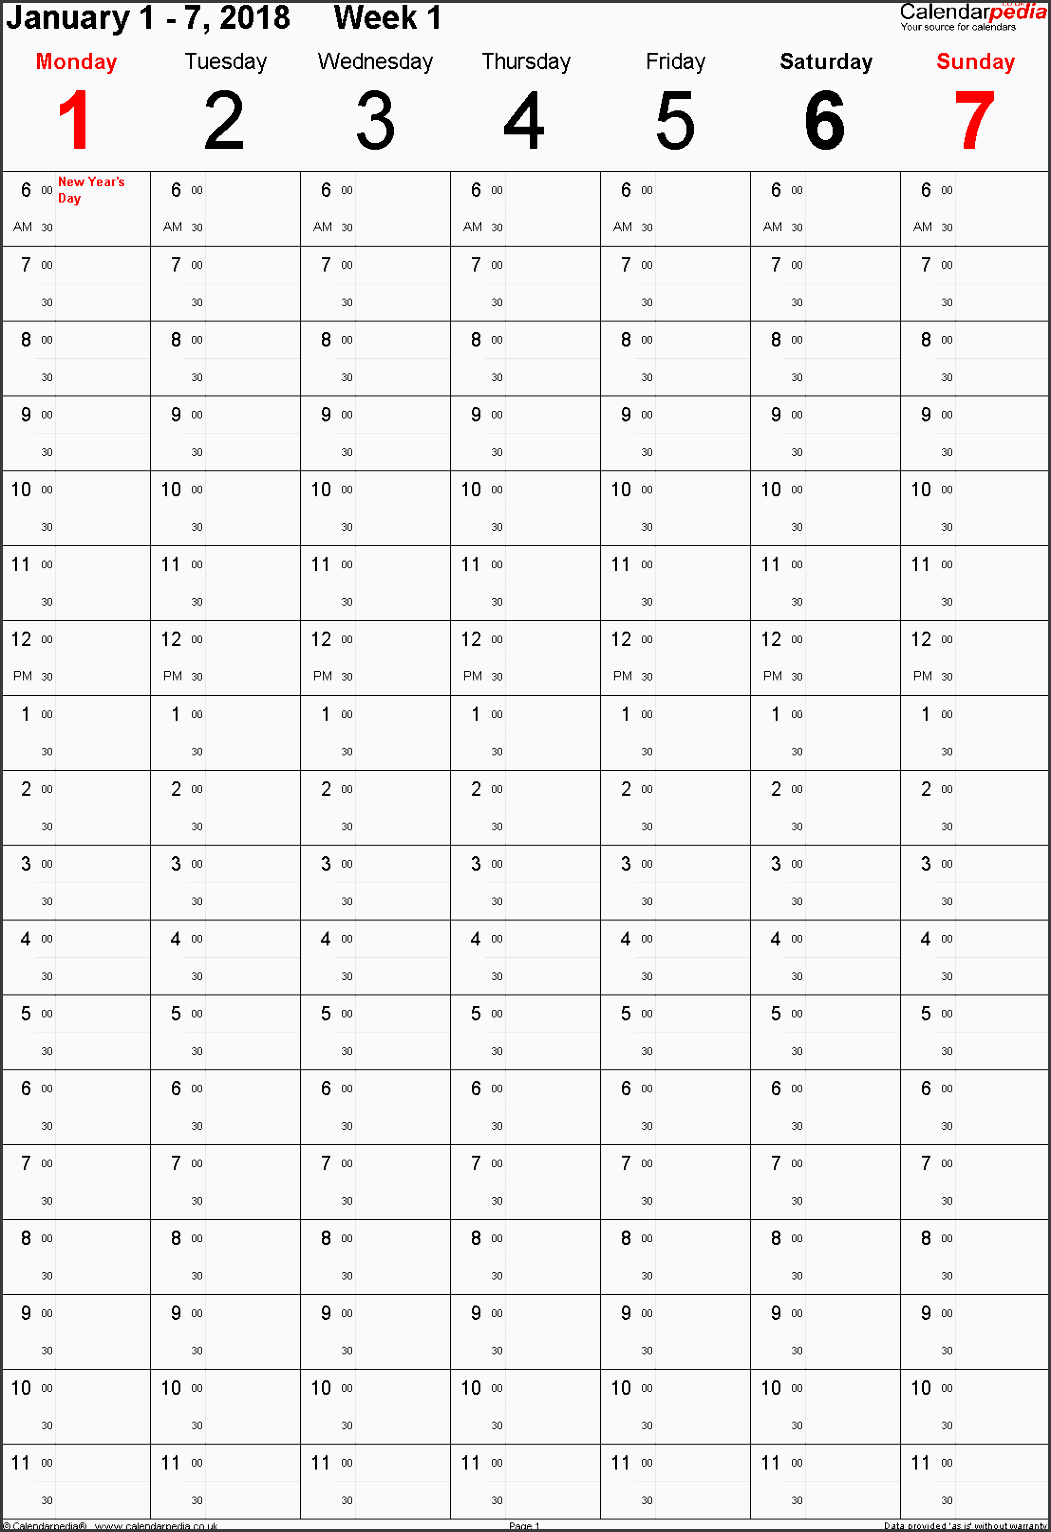 template 8 weekly calendar 2018 uk portrait orientation time planner layout